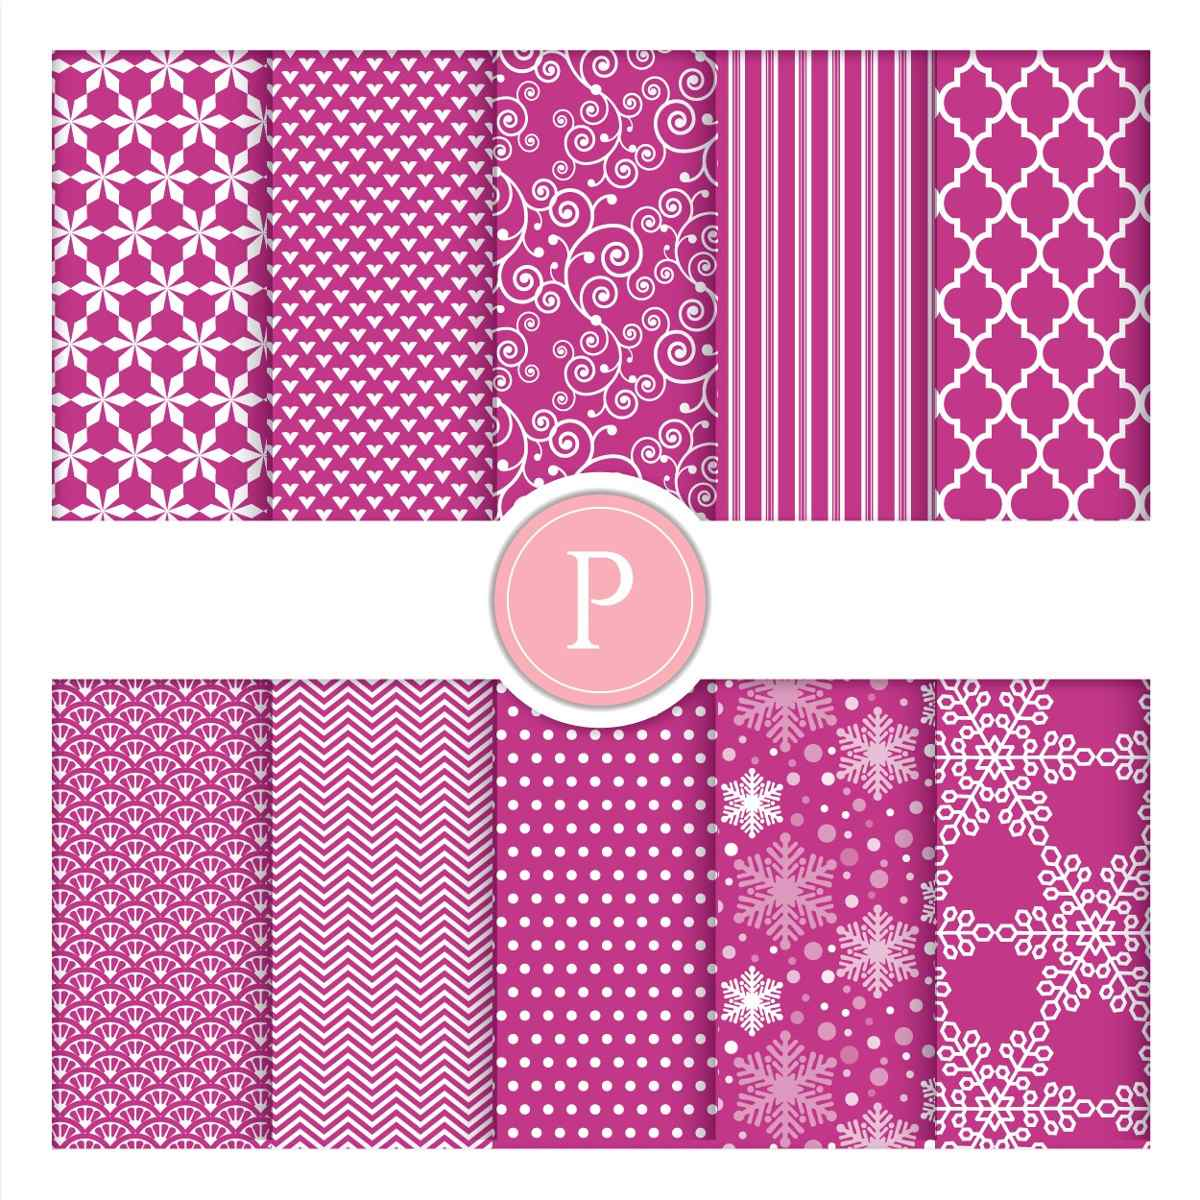 10 fls papel decorado p scrapbook frozen ana rosa a4 180 for Papel decorado rosa